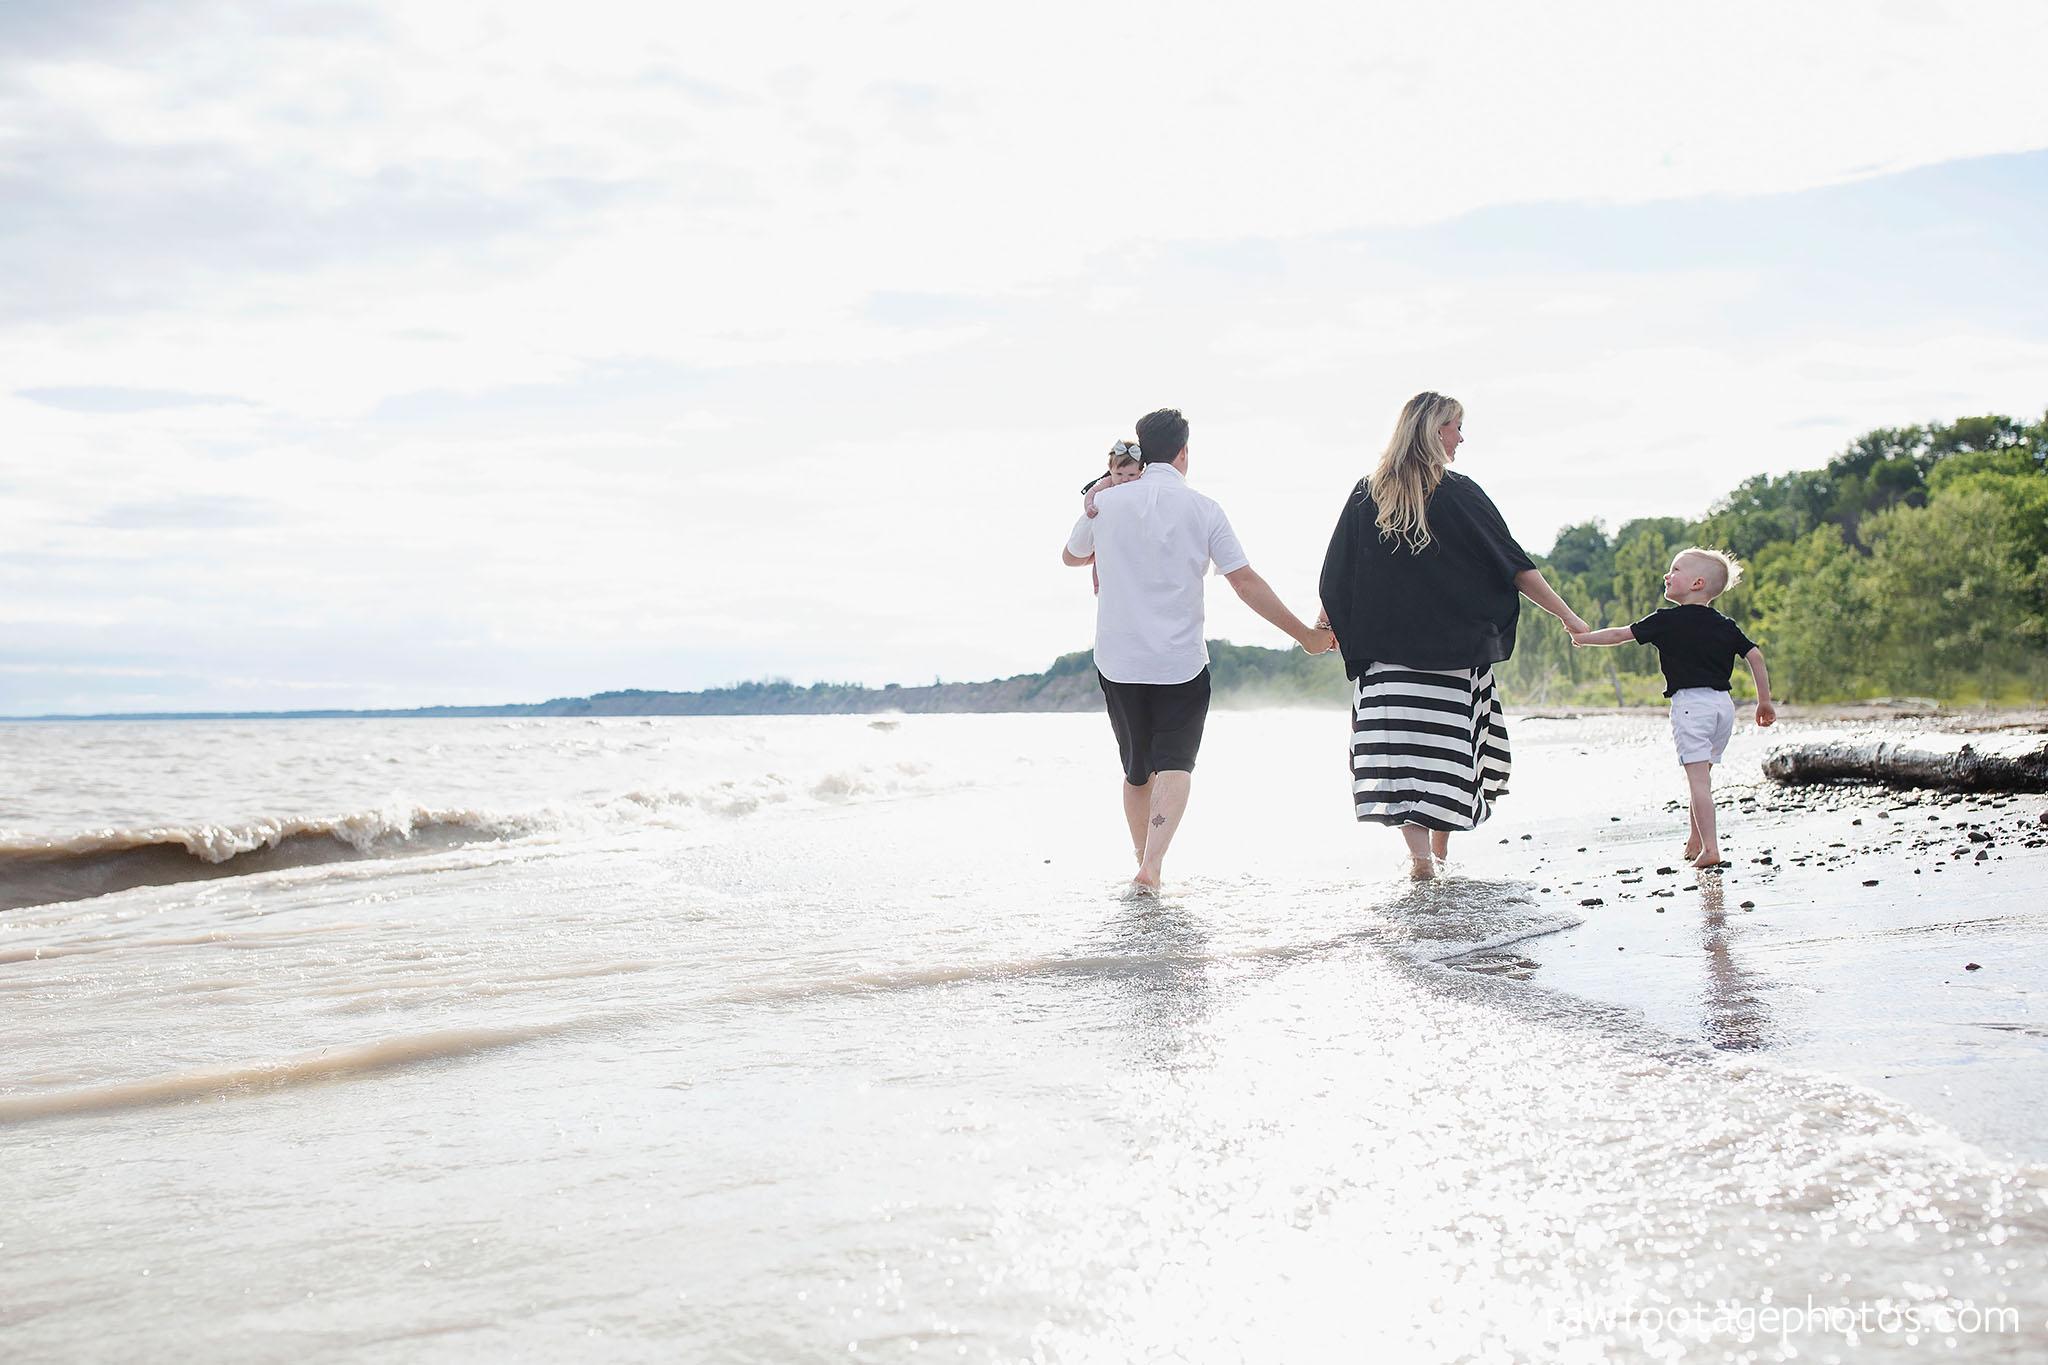 london_ontario_photographer-raw_footage_photography-beach_minis-port_stanley_beach-family_photographer-couple_photographer-lifestyle_photographer045.jpg